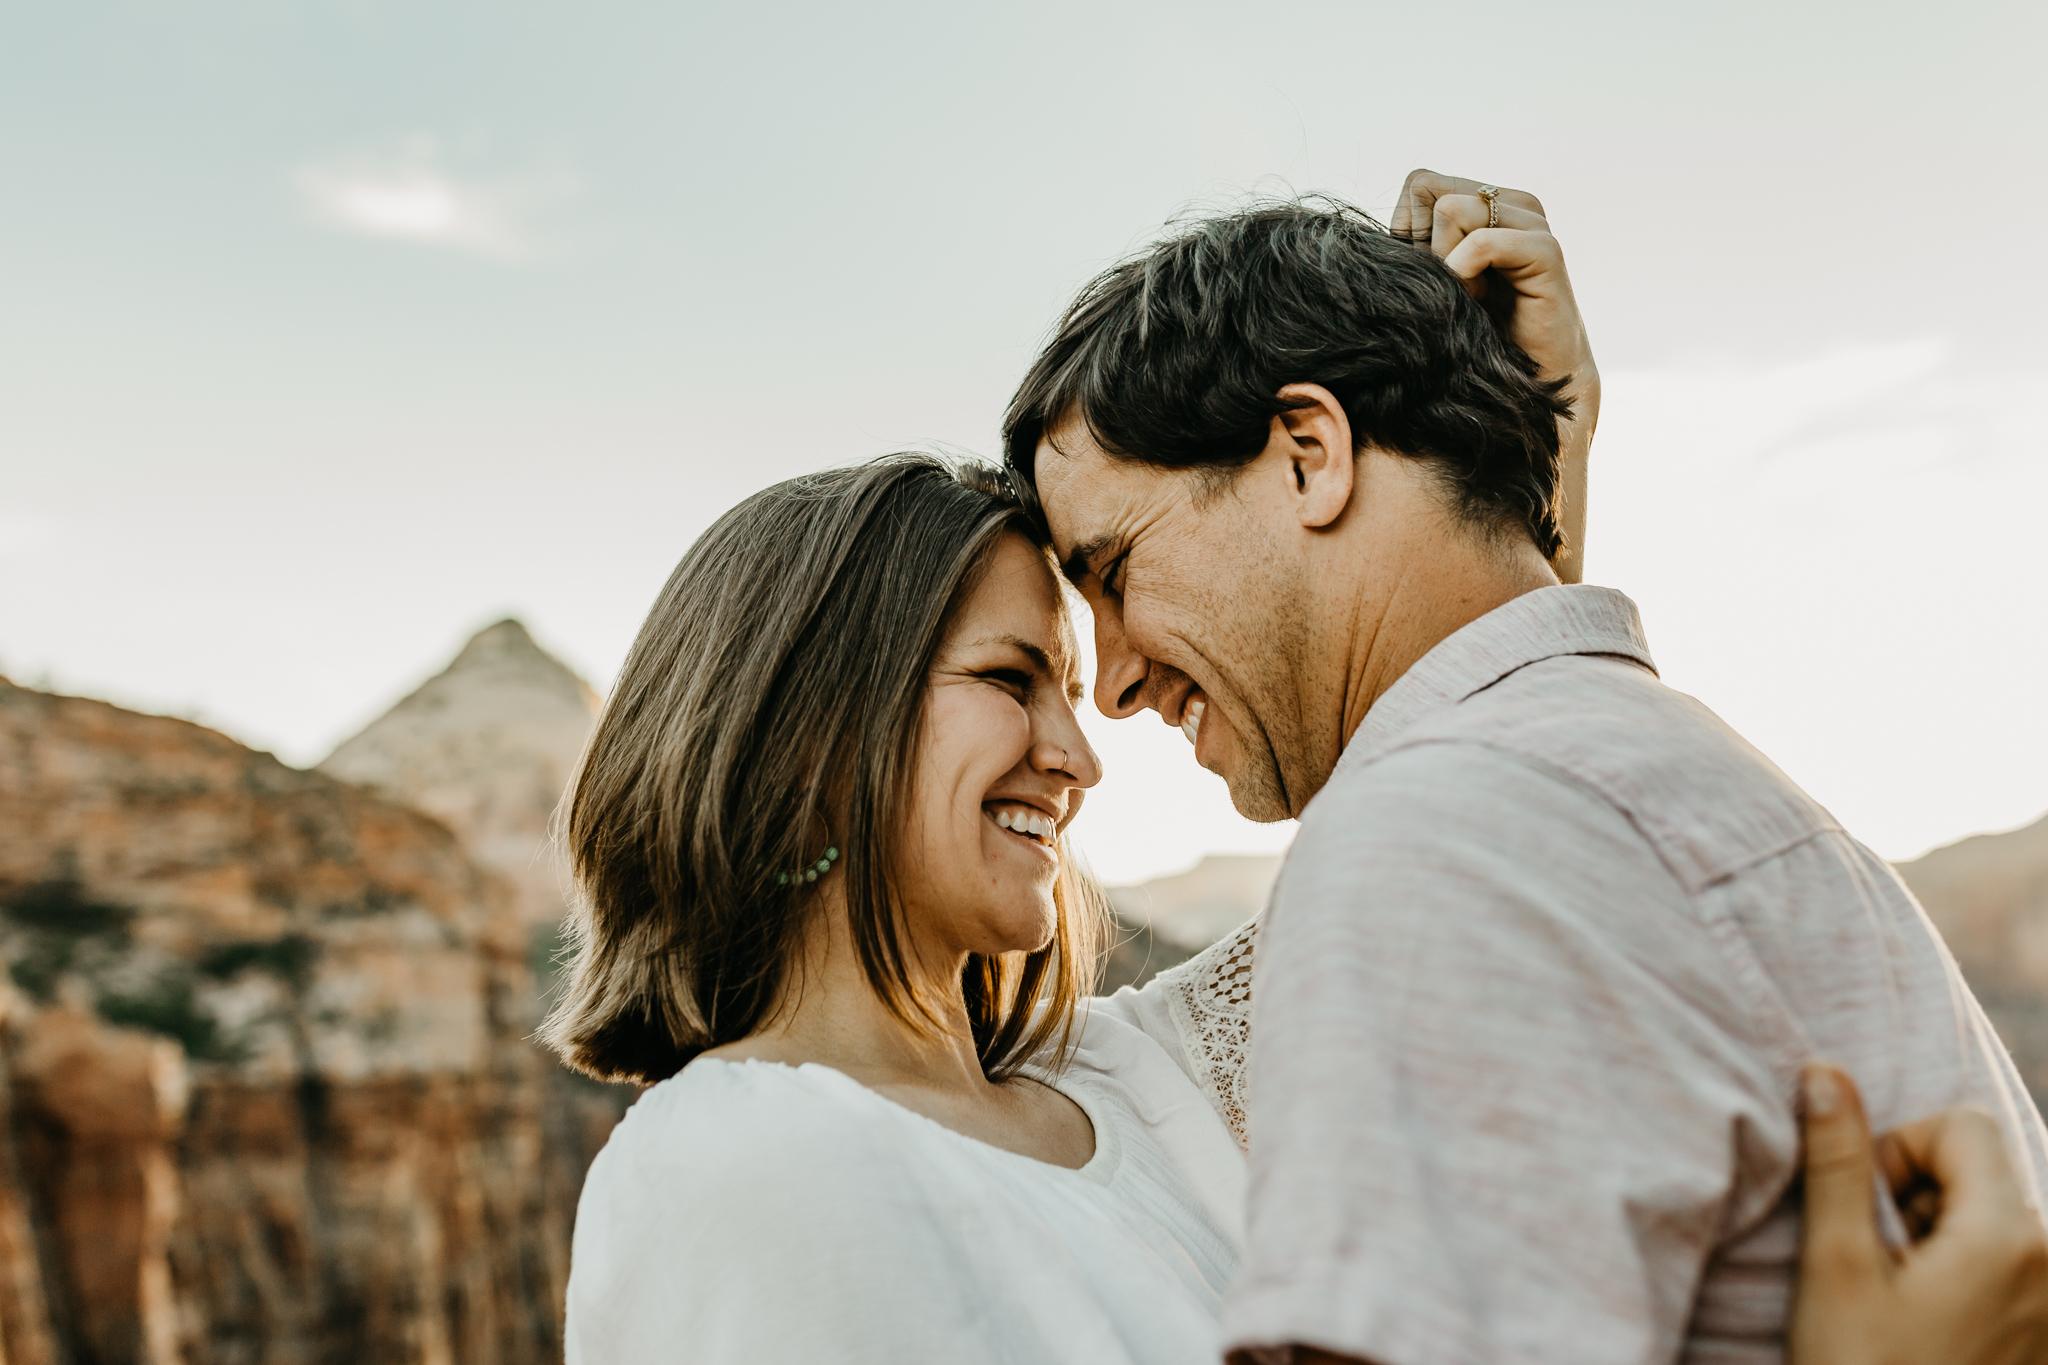 Abby&Austin-Engagement-shoot-Zion-National-Park-8771.jpg